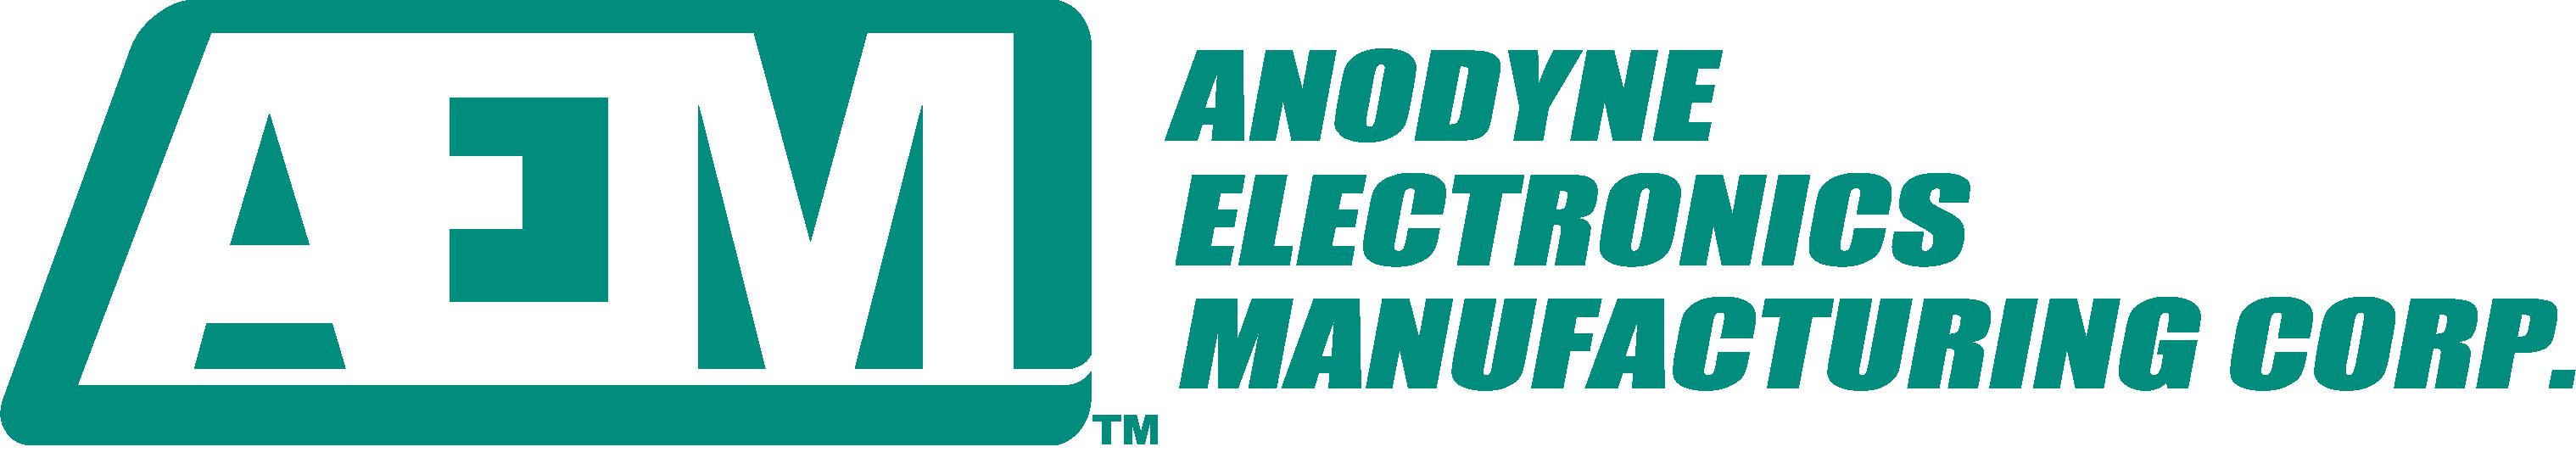 Anodyne Electronics Manufacturing Corp (AEM)